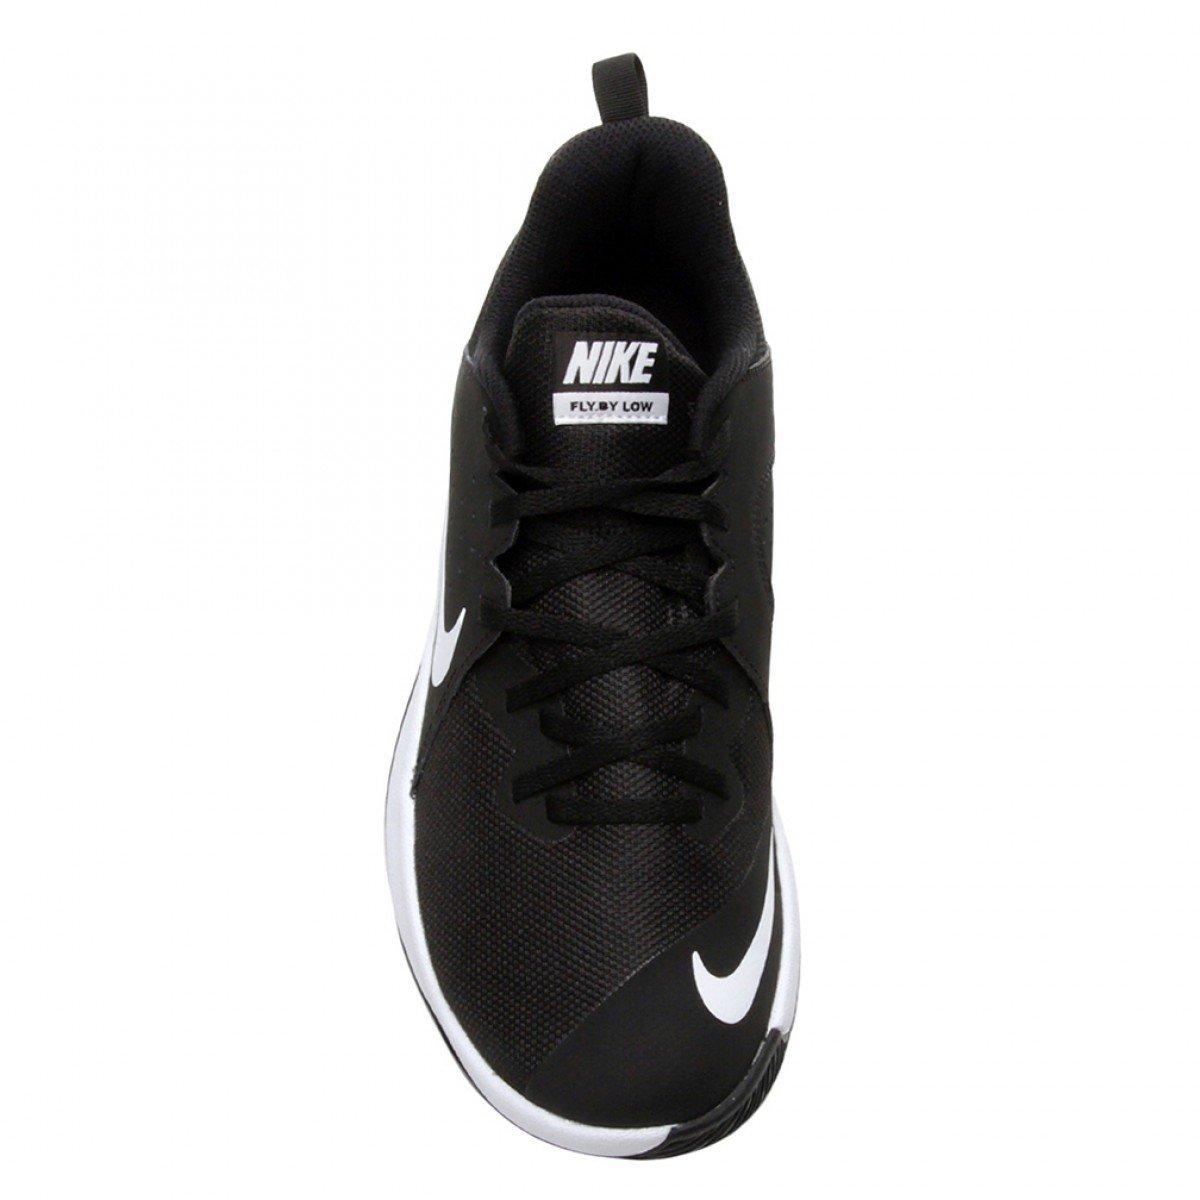 Tênis Nike Fly.By Low Masculino Preto e Branco - Compre Agora ... 53eae41e08974